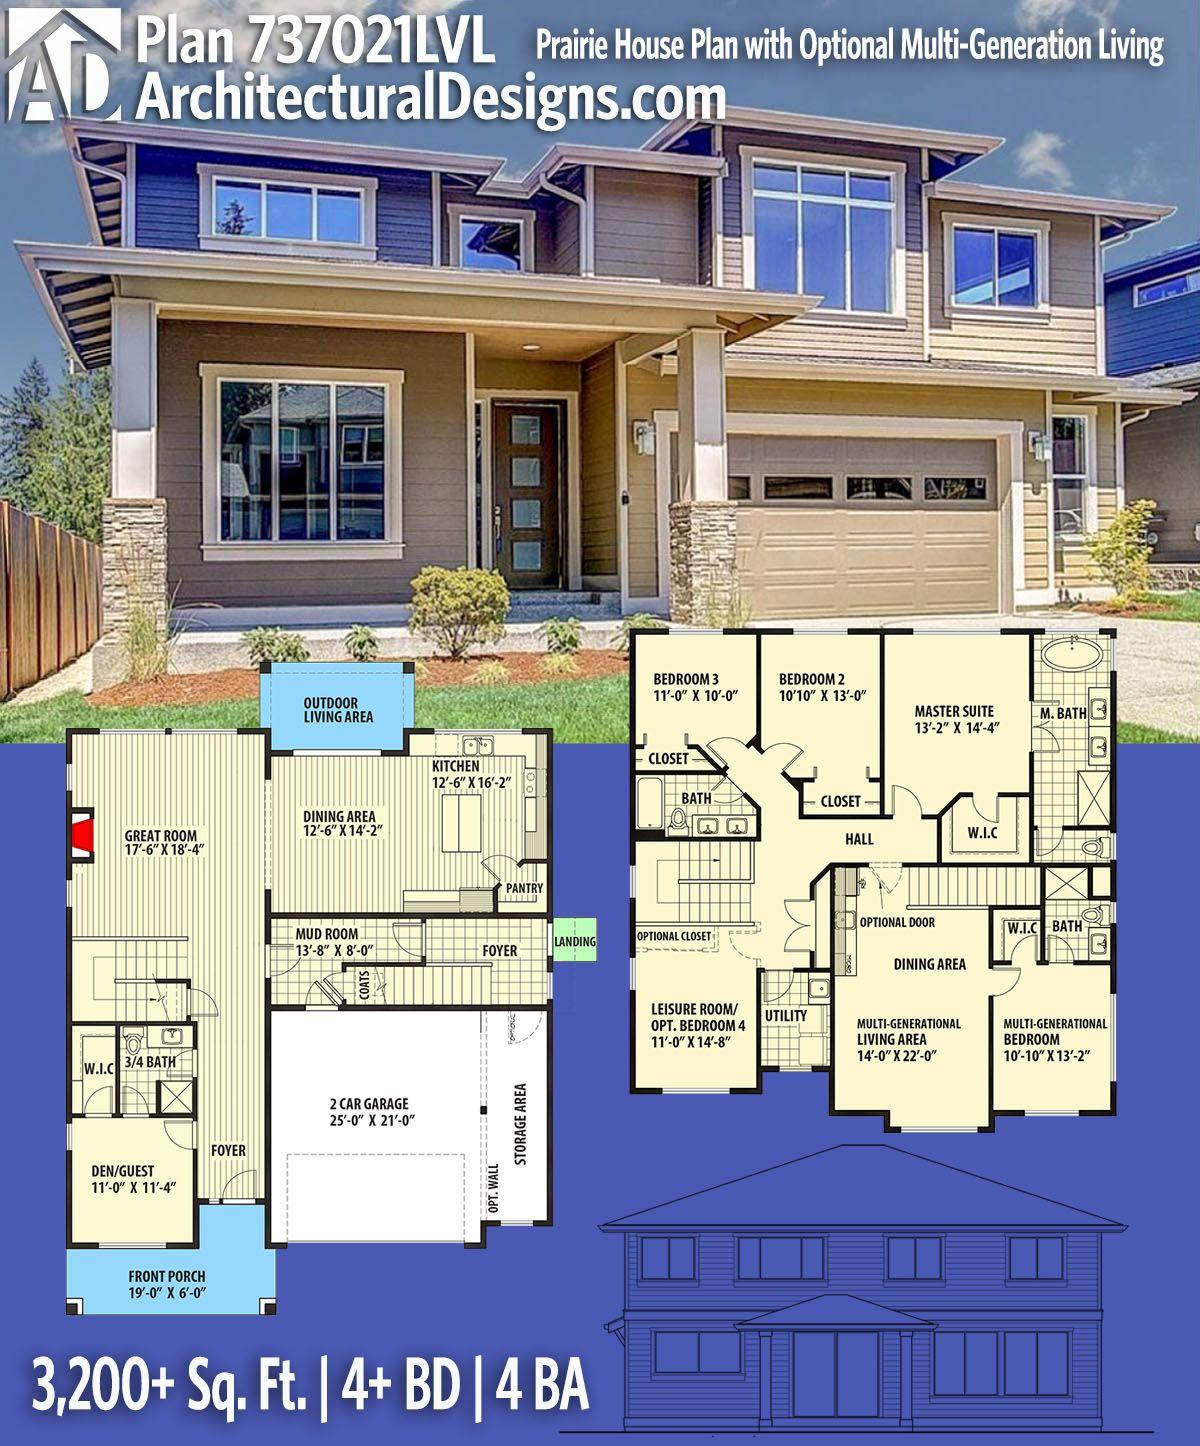 Plan lvl prairie house plan with optional multigeneration